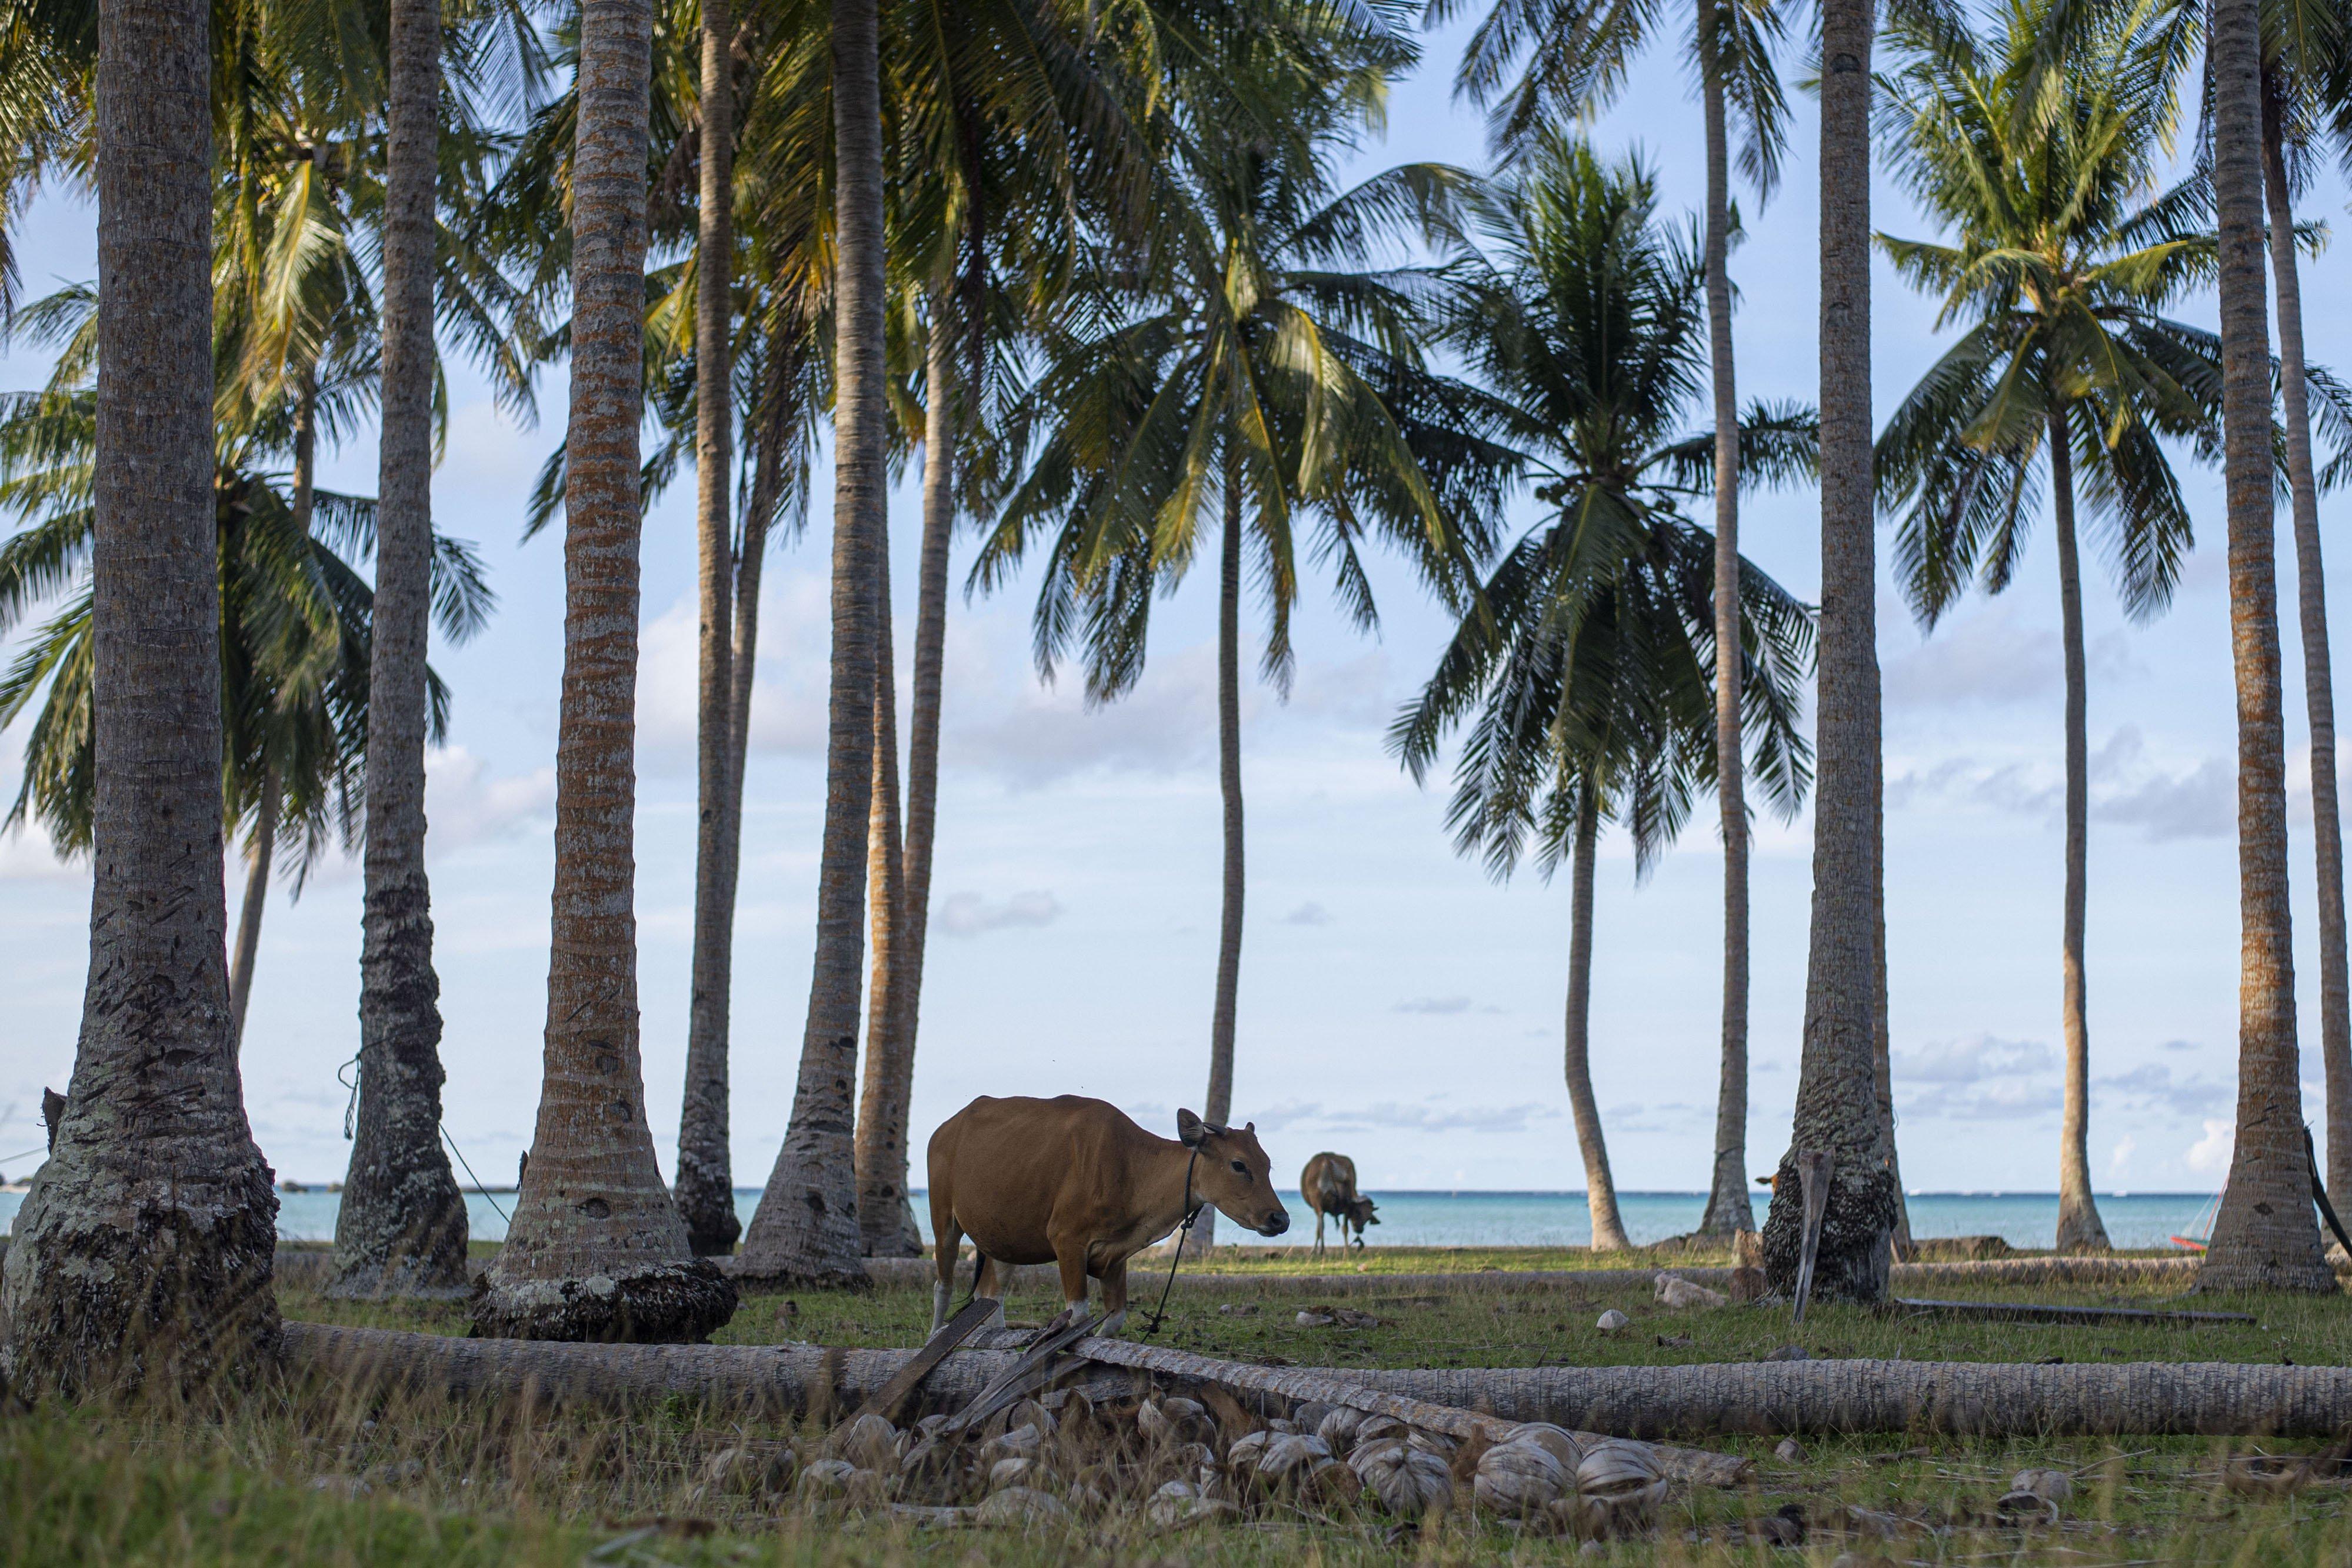 Sapi ternak warga mencari makan rumput di antara pepohonan kelapa di Pulau Laut, Kabupaten Natuna, Kepulauan Riau.